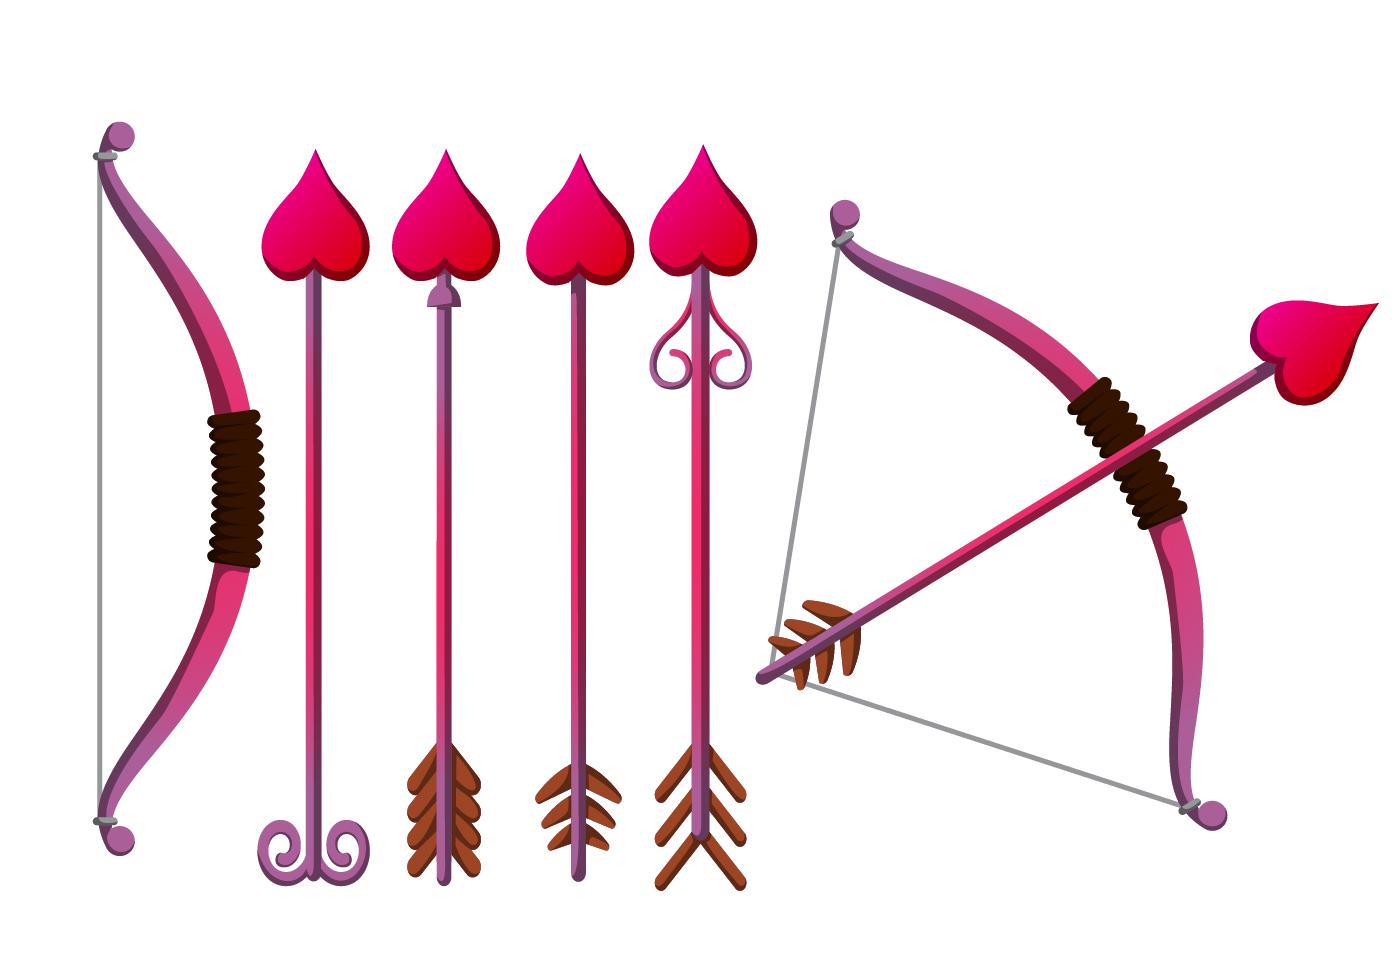 Cupid S Bow Vector Set on Lawn Sprinkler Backflow Preventer Diagram